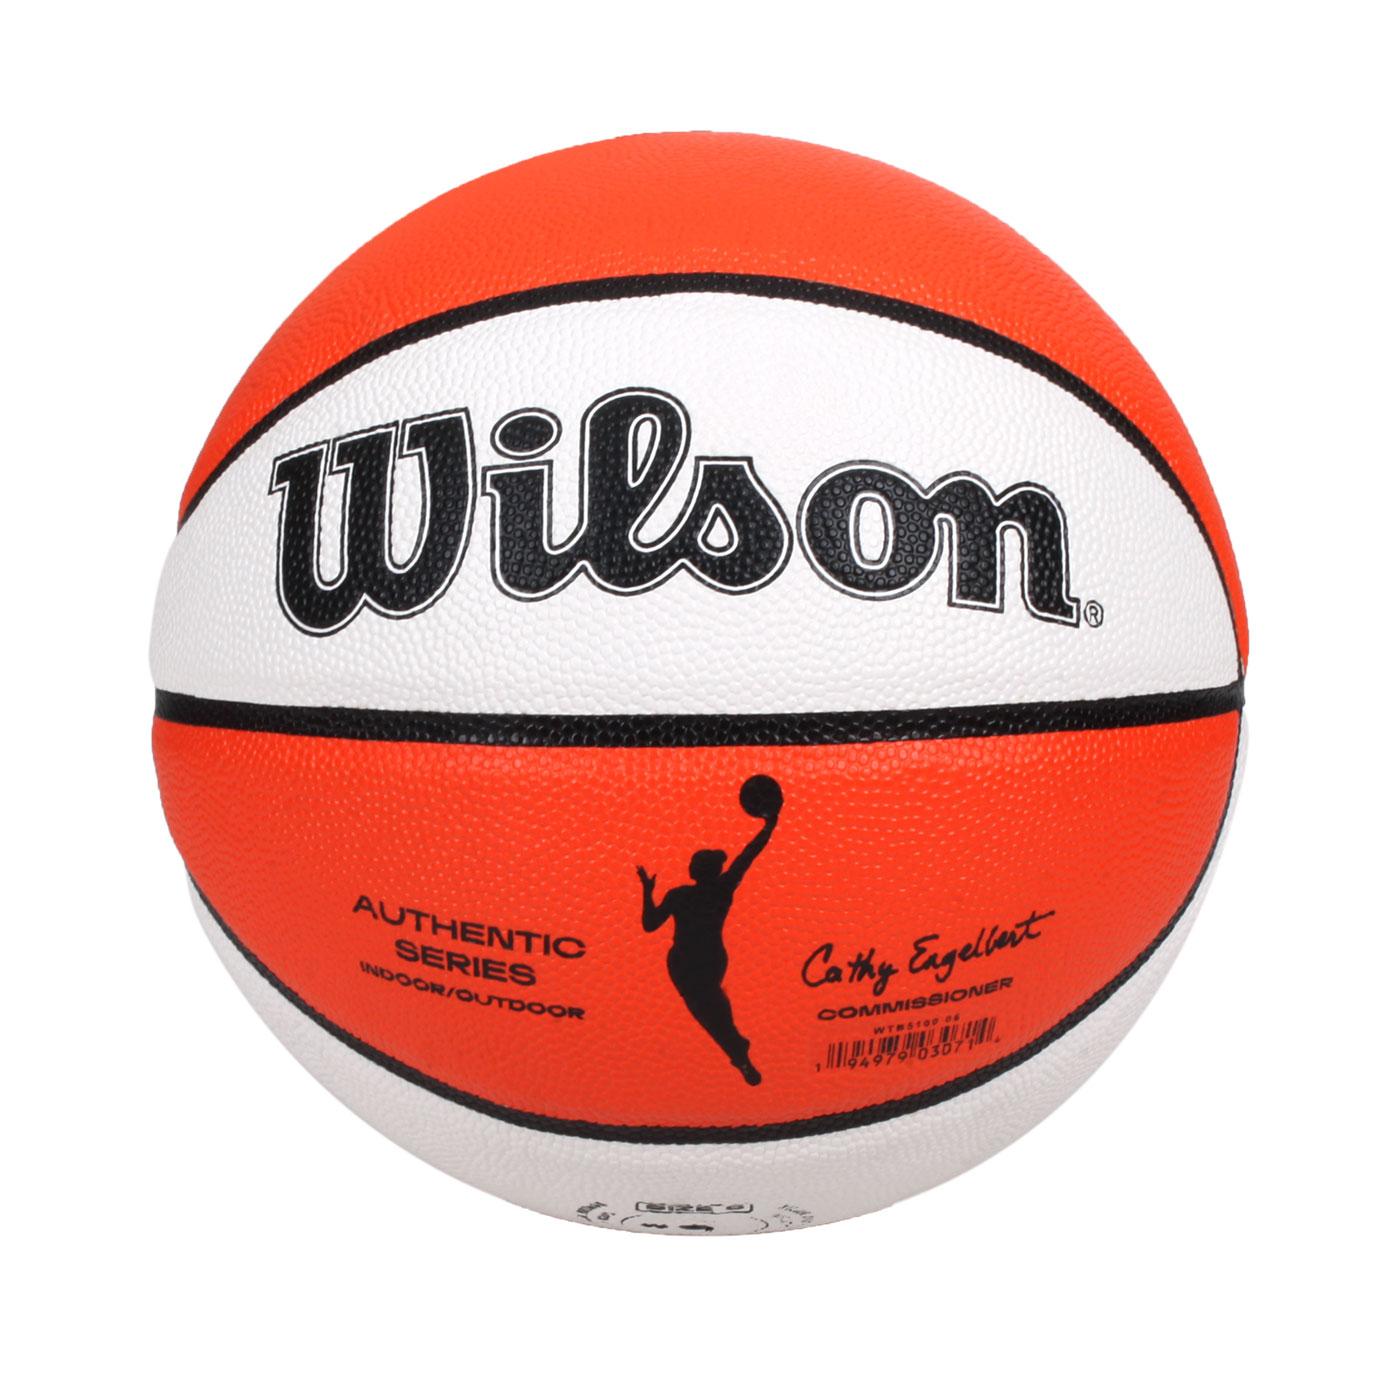 WILSON WNBA AUTH系列室外合成皮籃球#6 WTB5100XB06